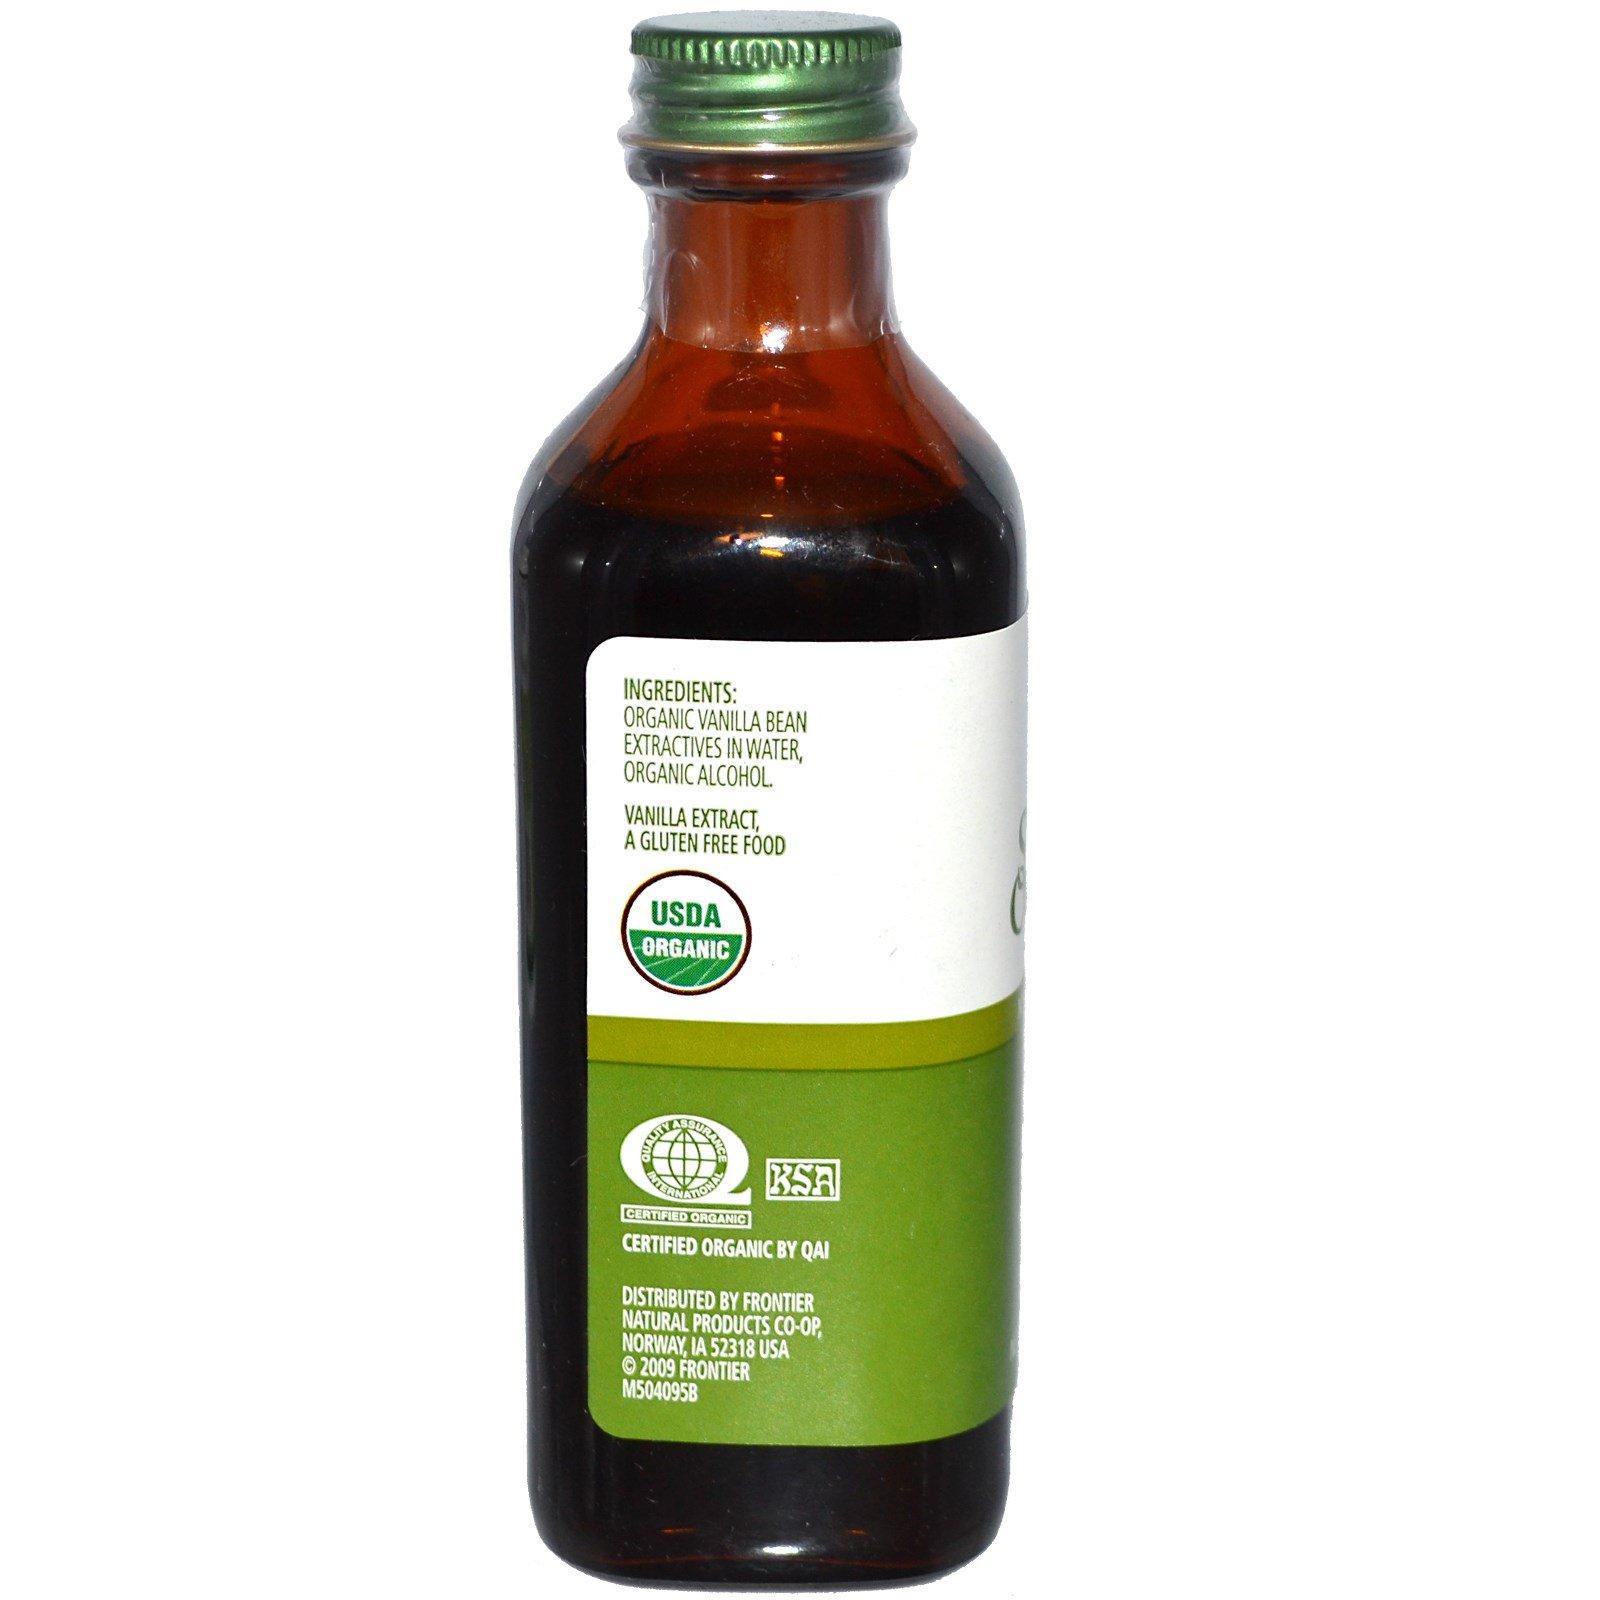 Natural Vanilla Flavor Vs Vanilla Extract